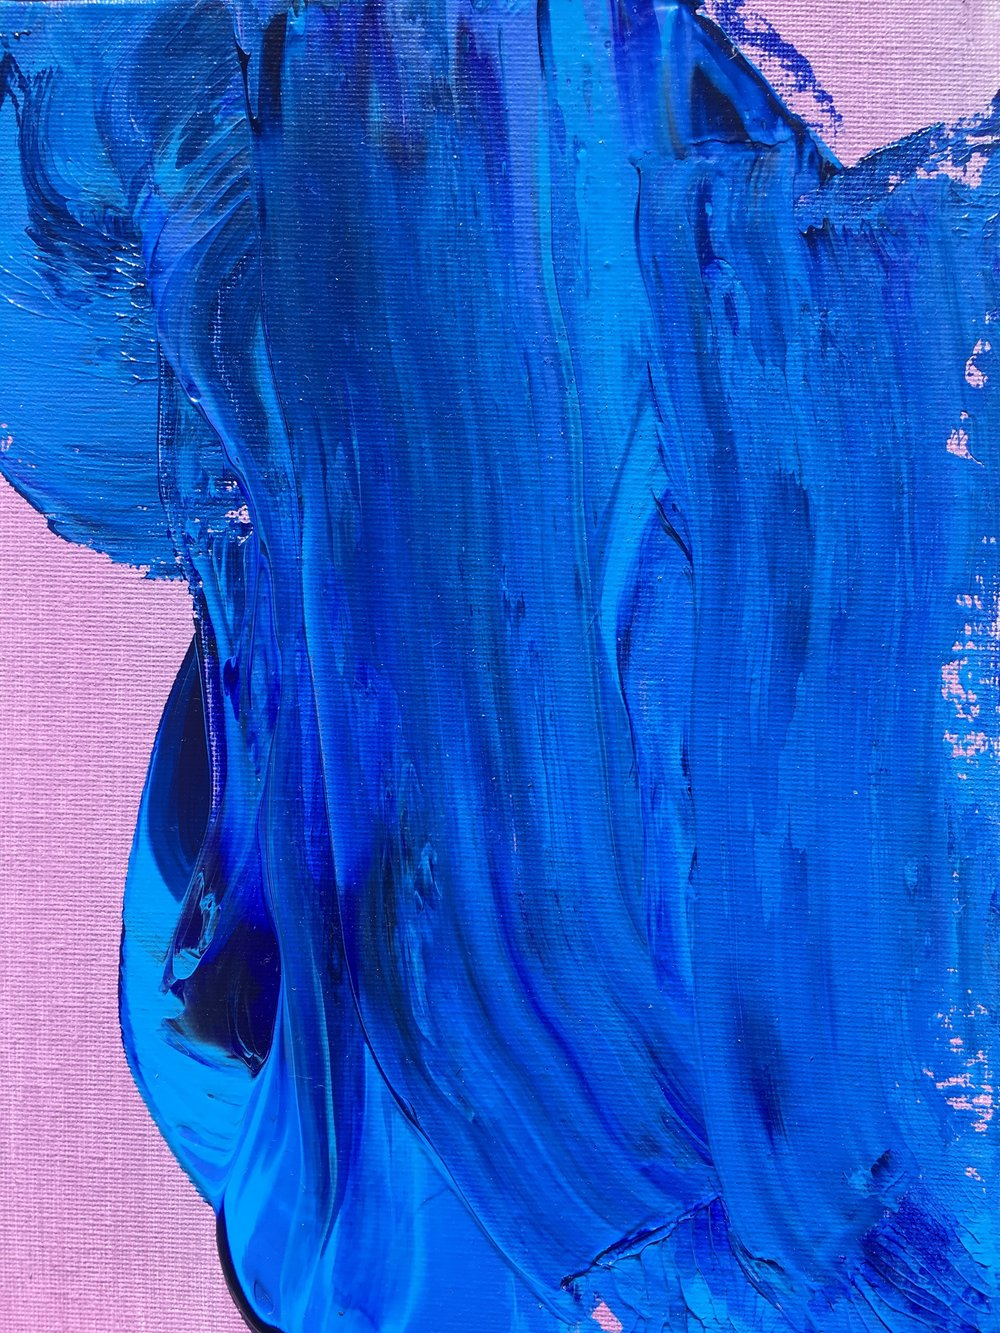 "purple haze, acrylic paint, 8"" x 10"" panels, (2018)"